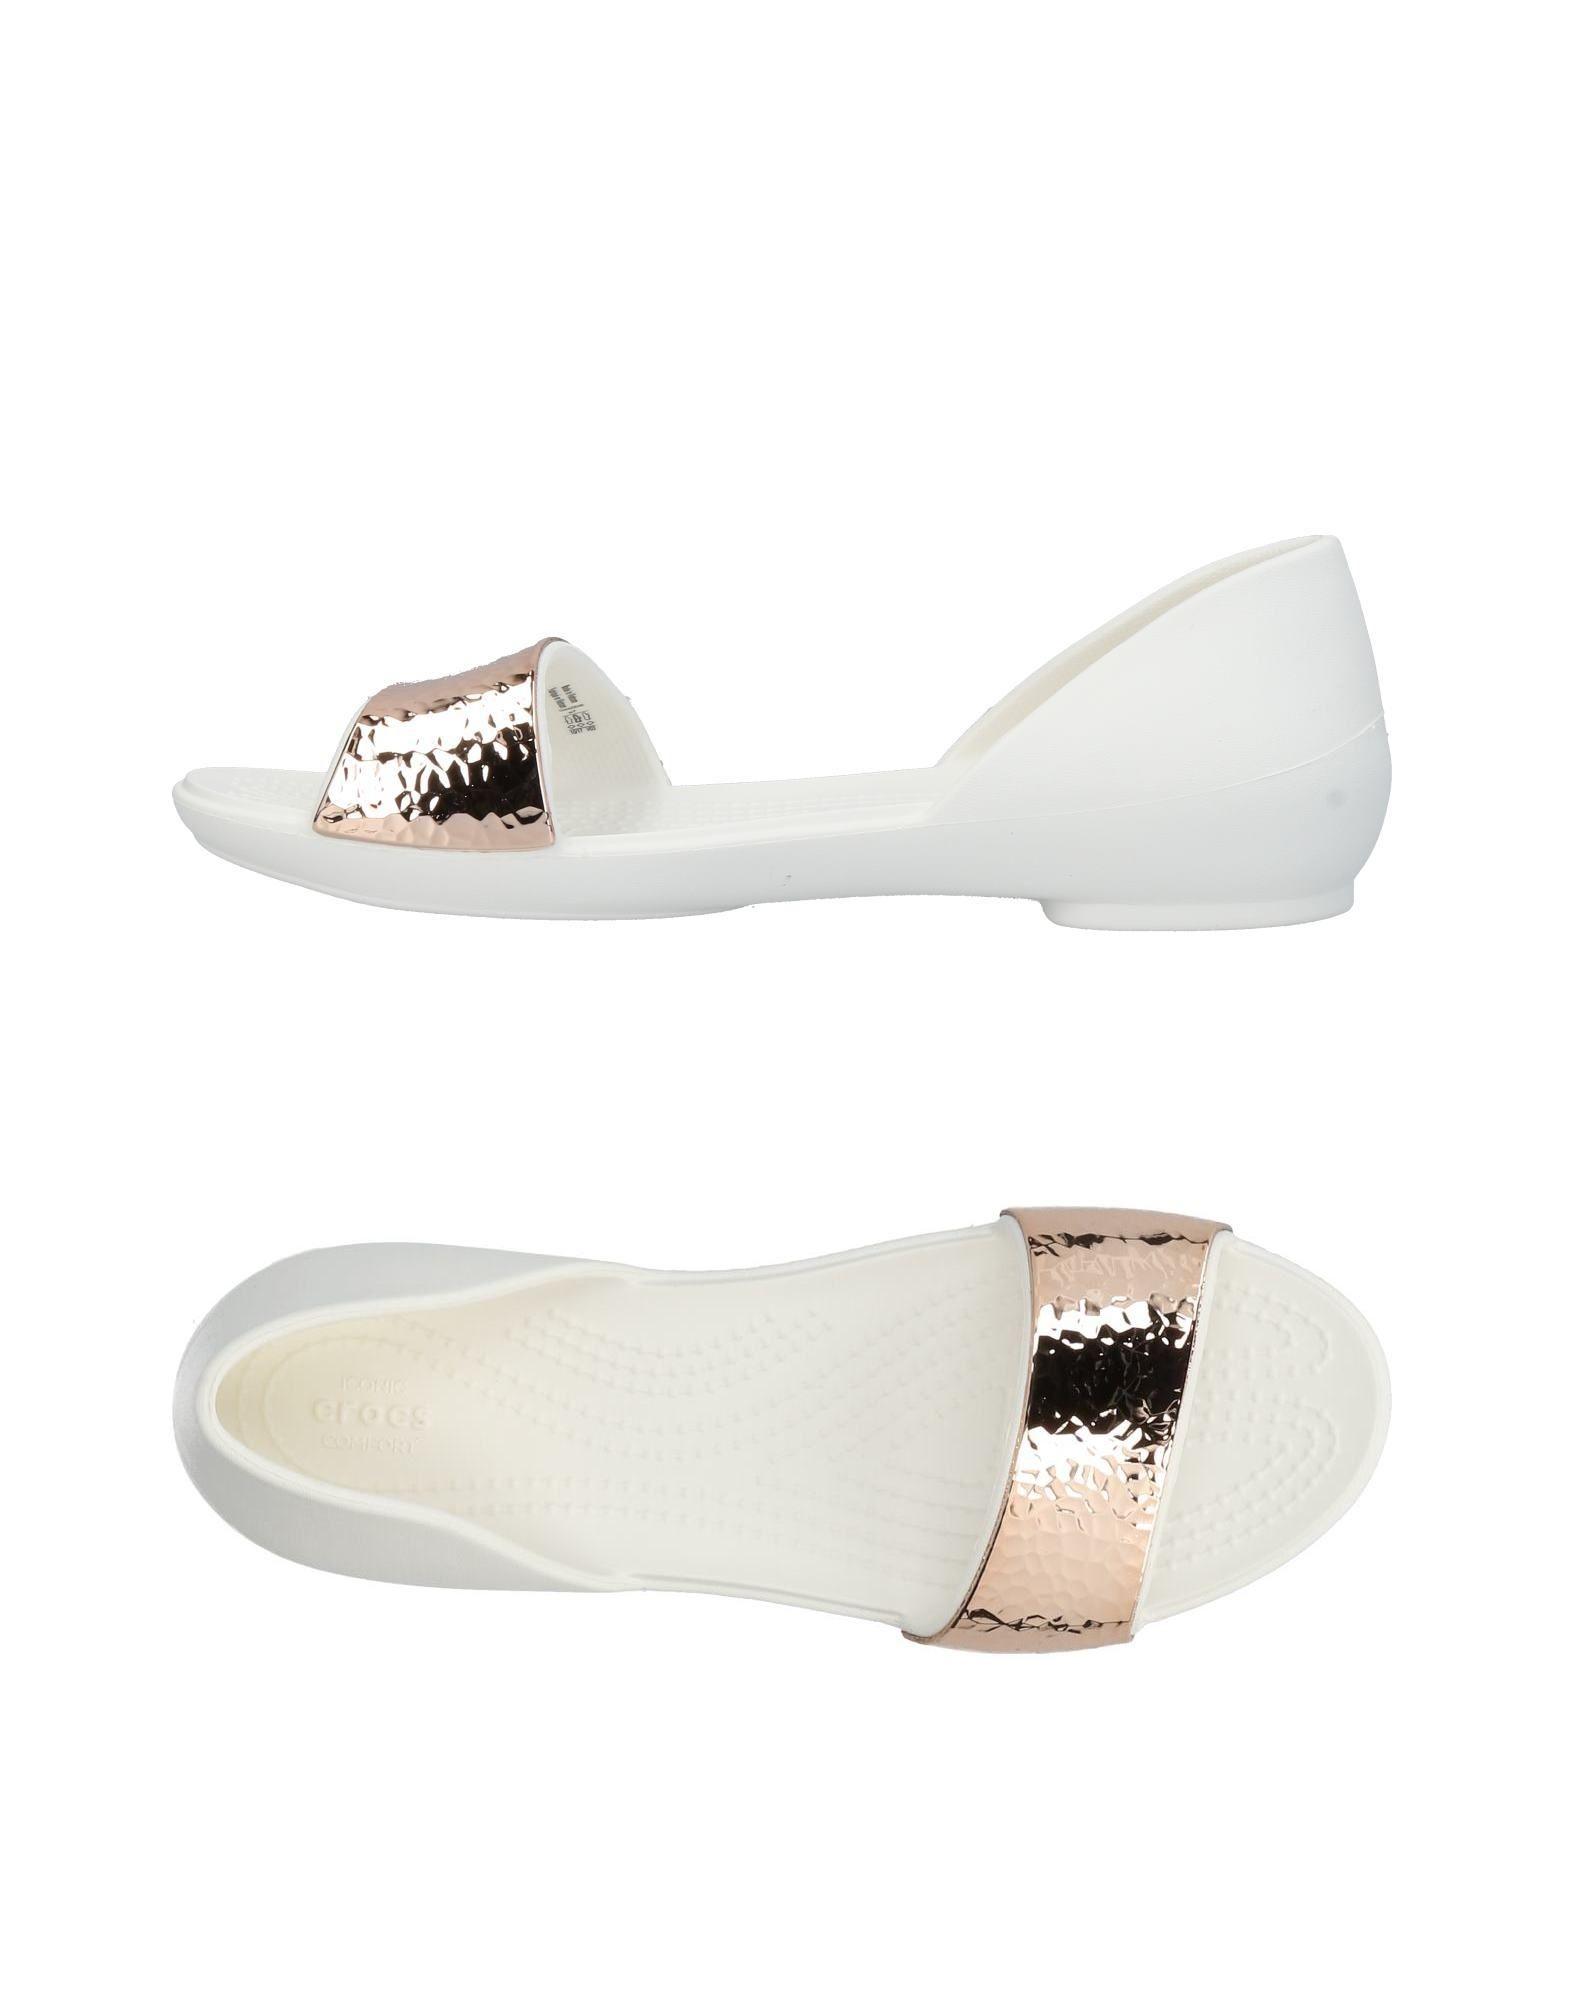 Crocs on Ballet Flats - Women Crocs Ballet Flats online on Crocs  Canada - 11441595AW afb1a1